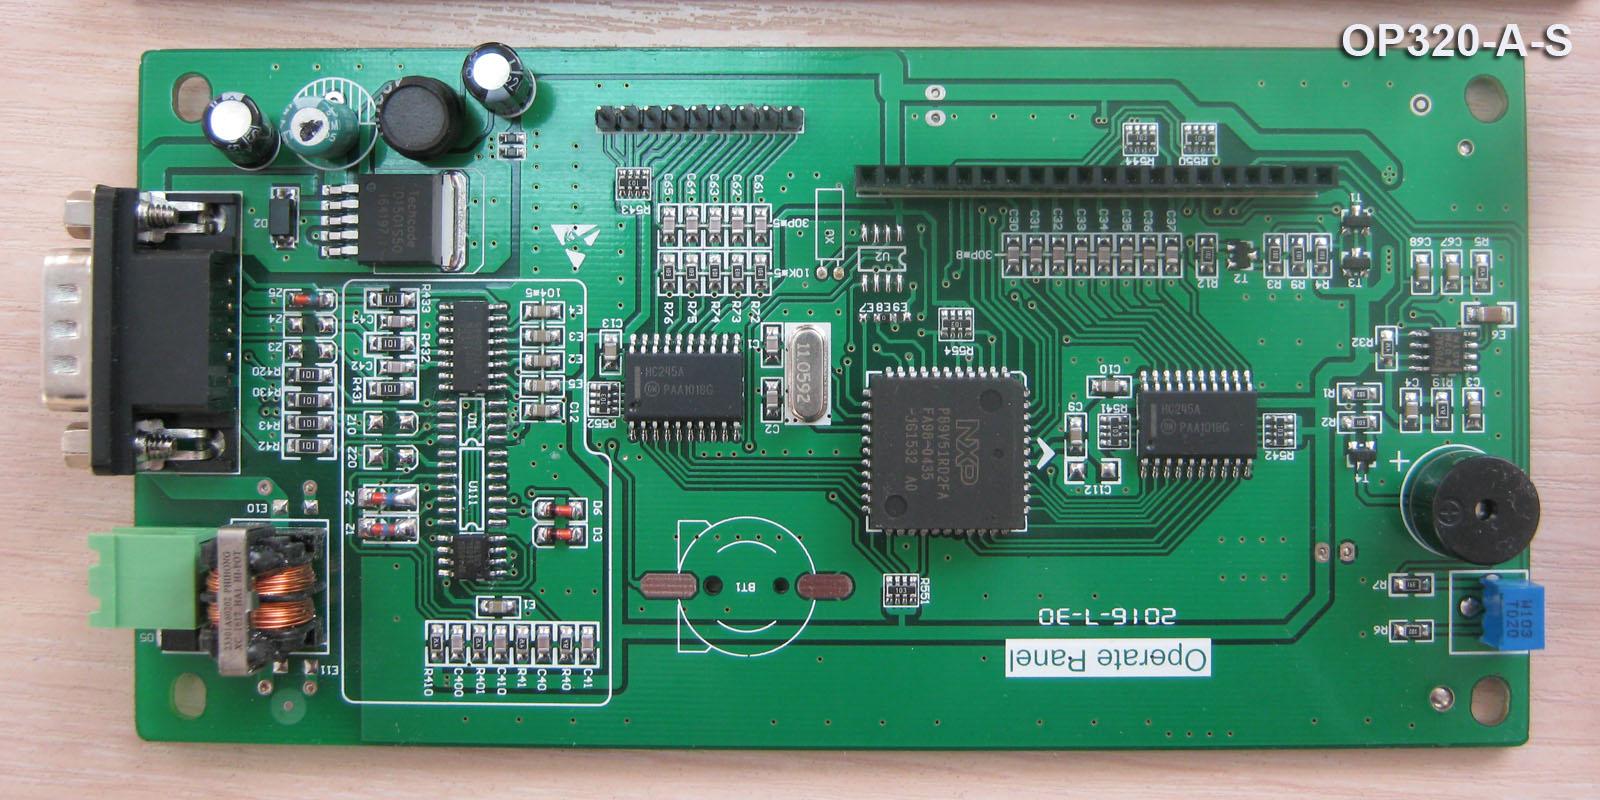 Рис. 17 — Процессорная плата OP320-A-S